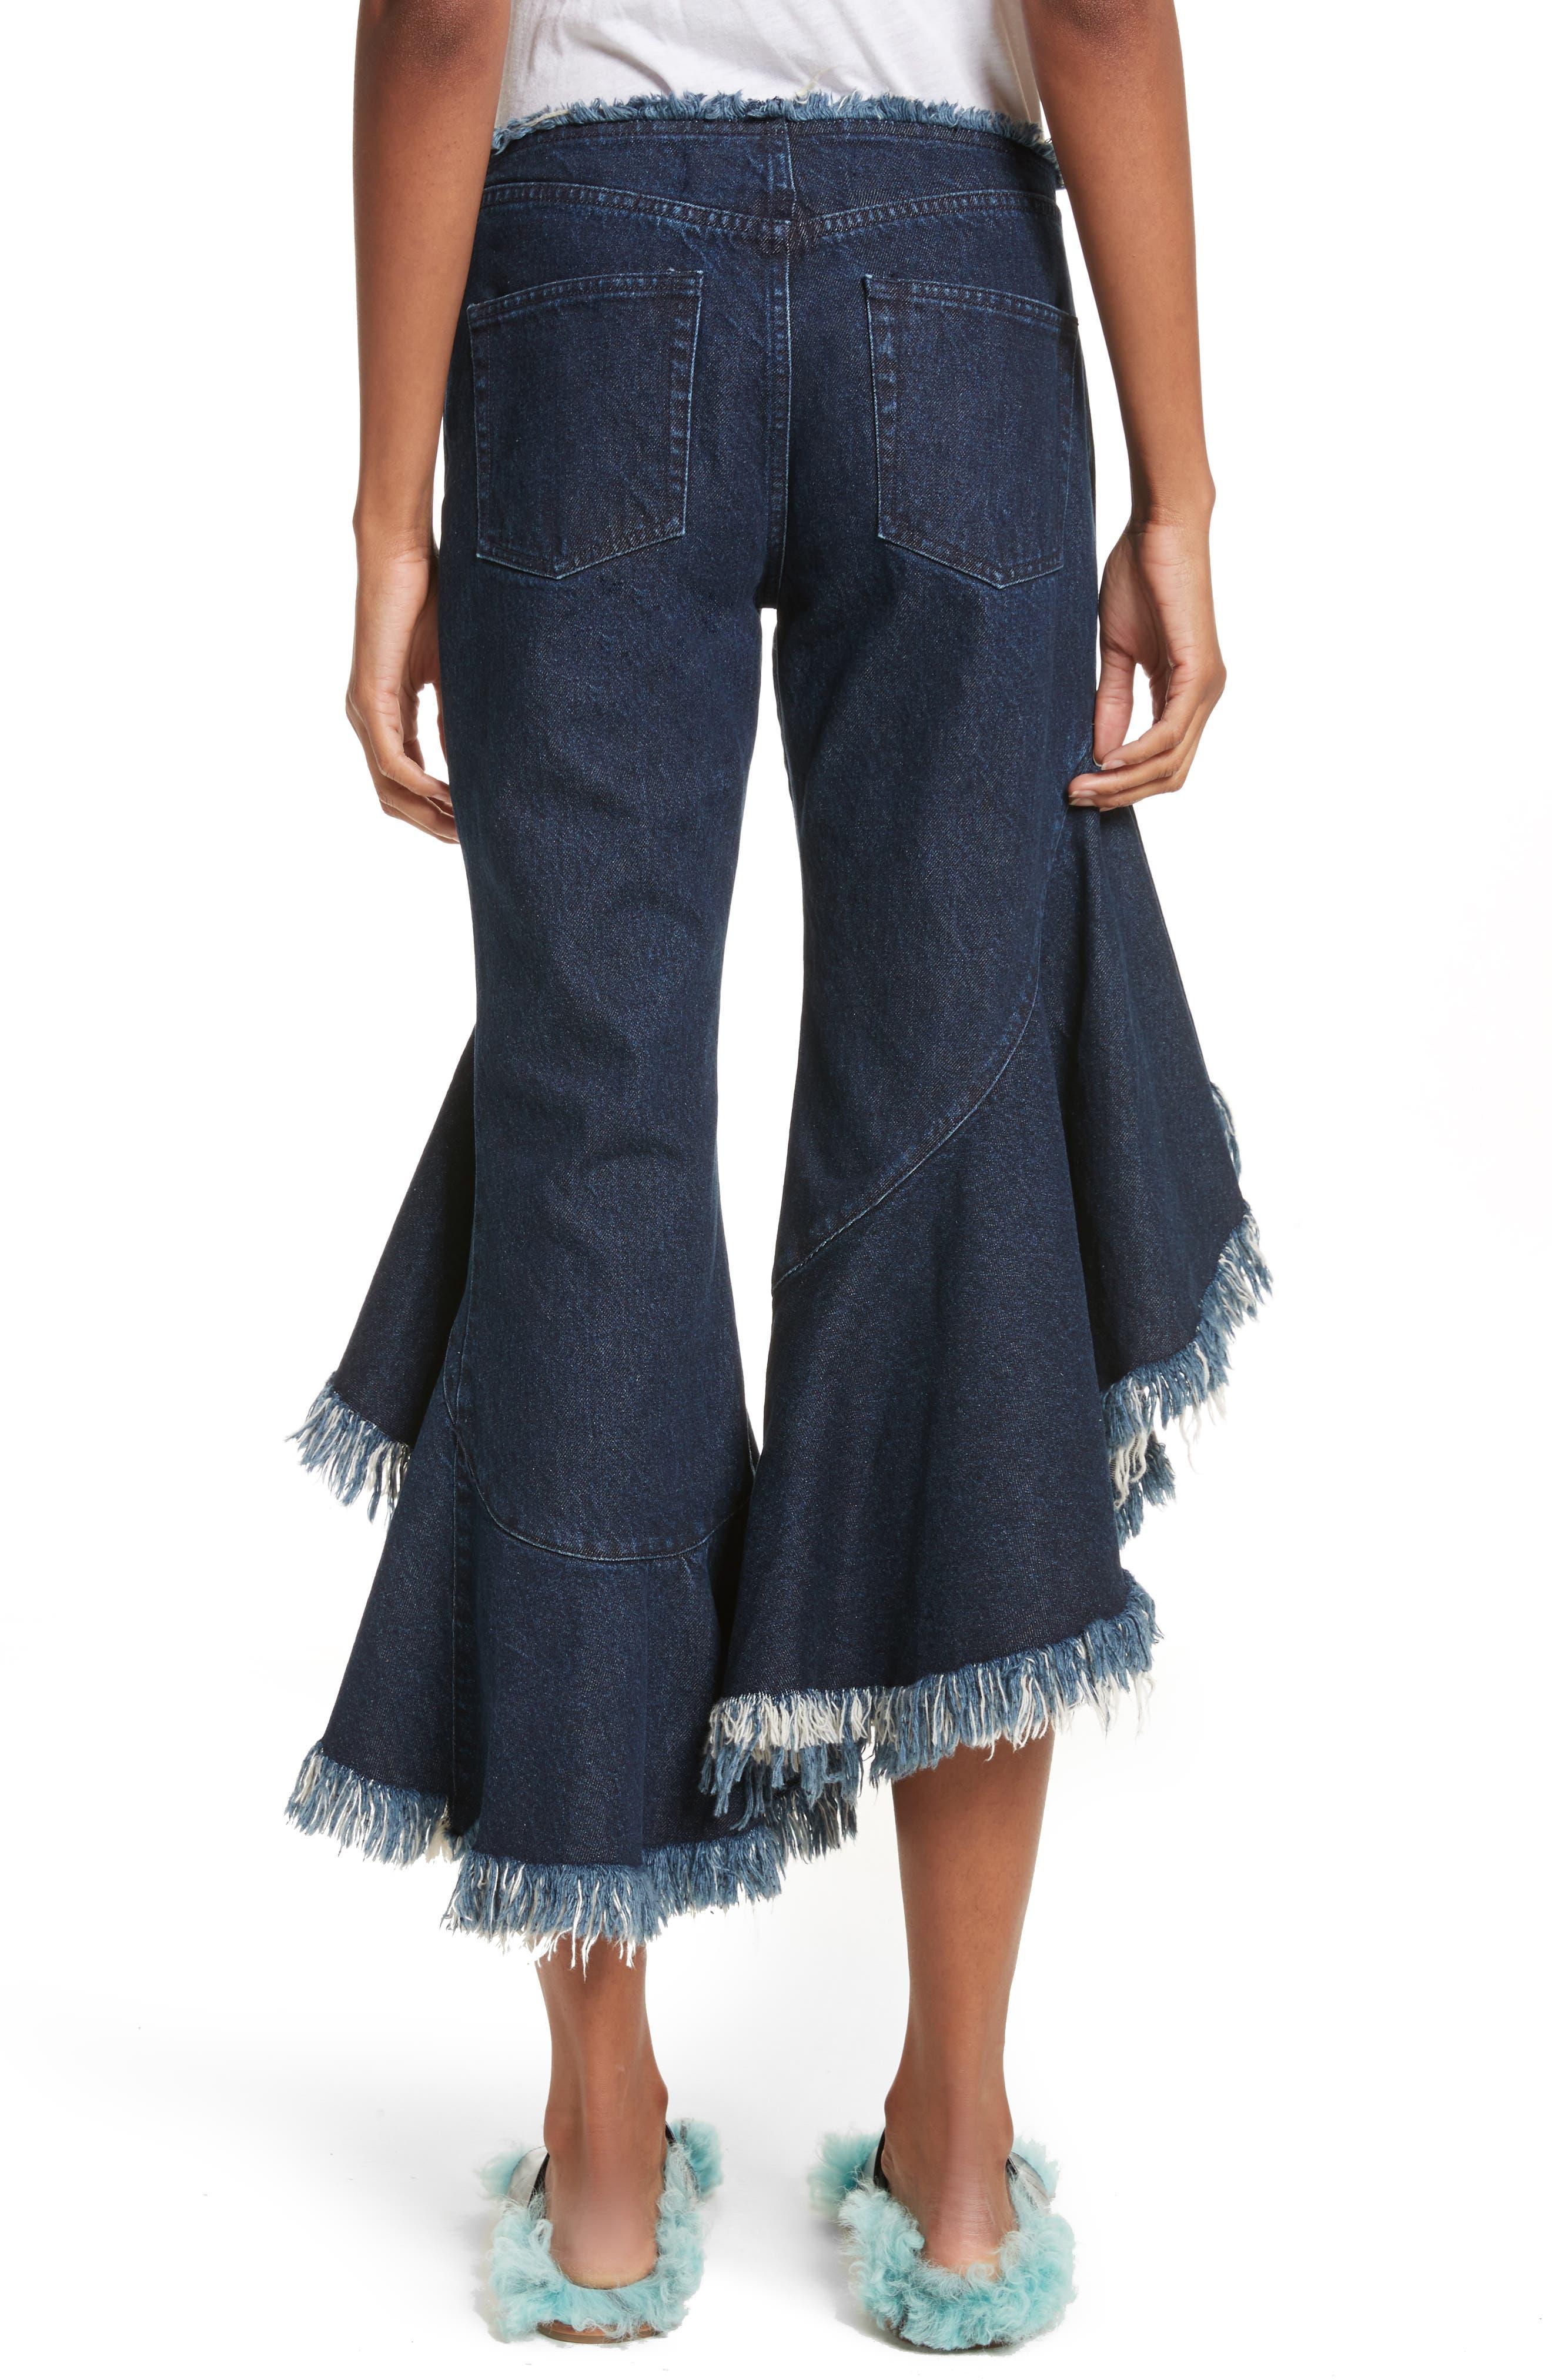 Marques'Almeida Frill Flare Crop Jeans,                             Alternate thumbnail 3, color,                             Indigo